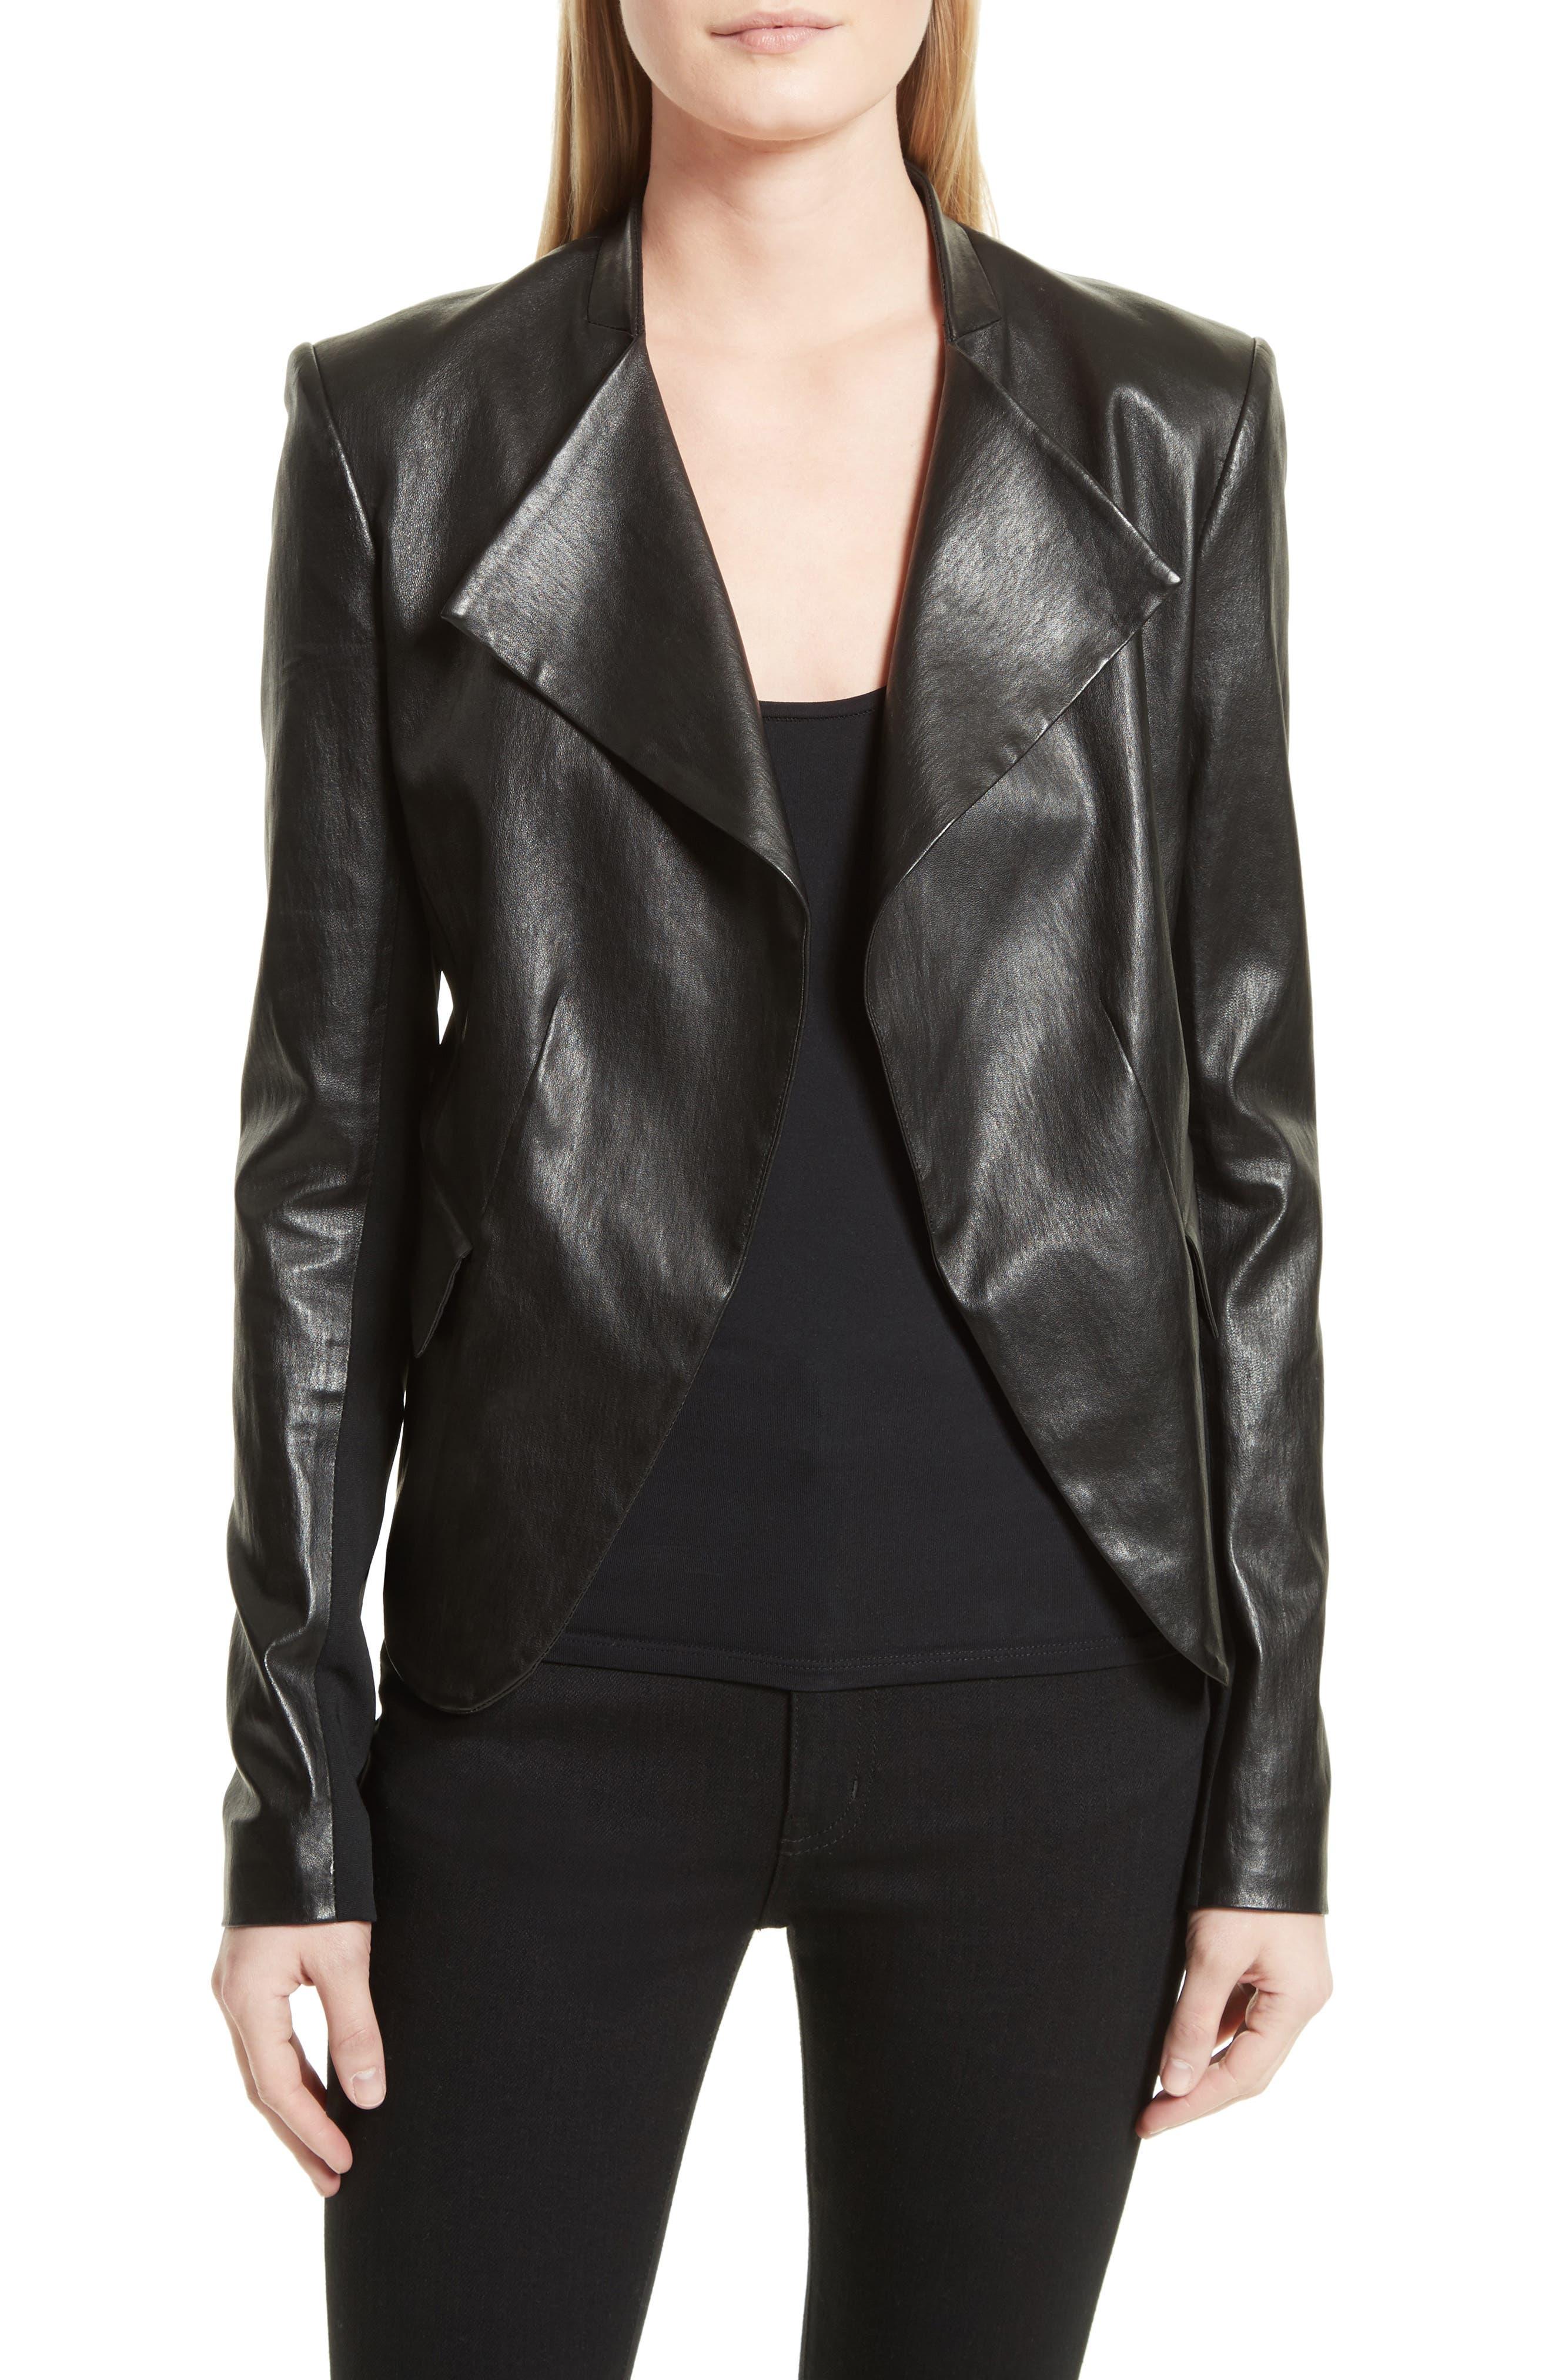 Bristol Peplum Leather Jacket,                         Main,                         color, 001